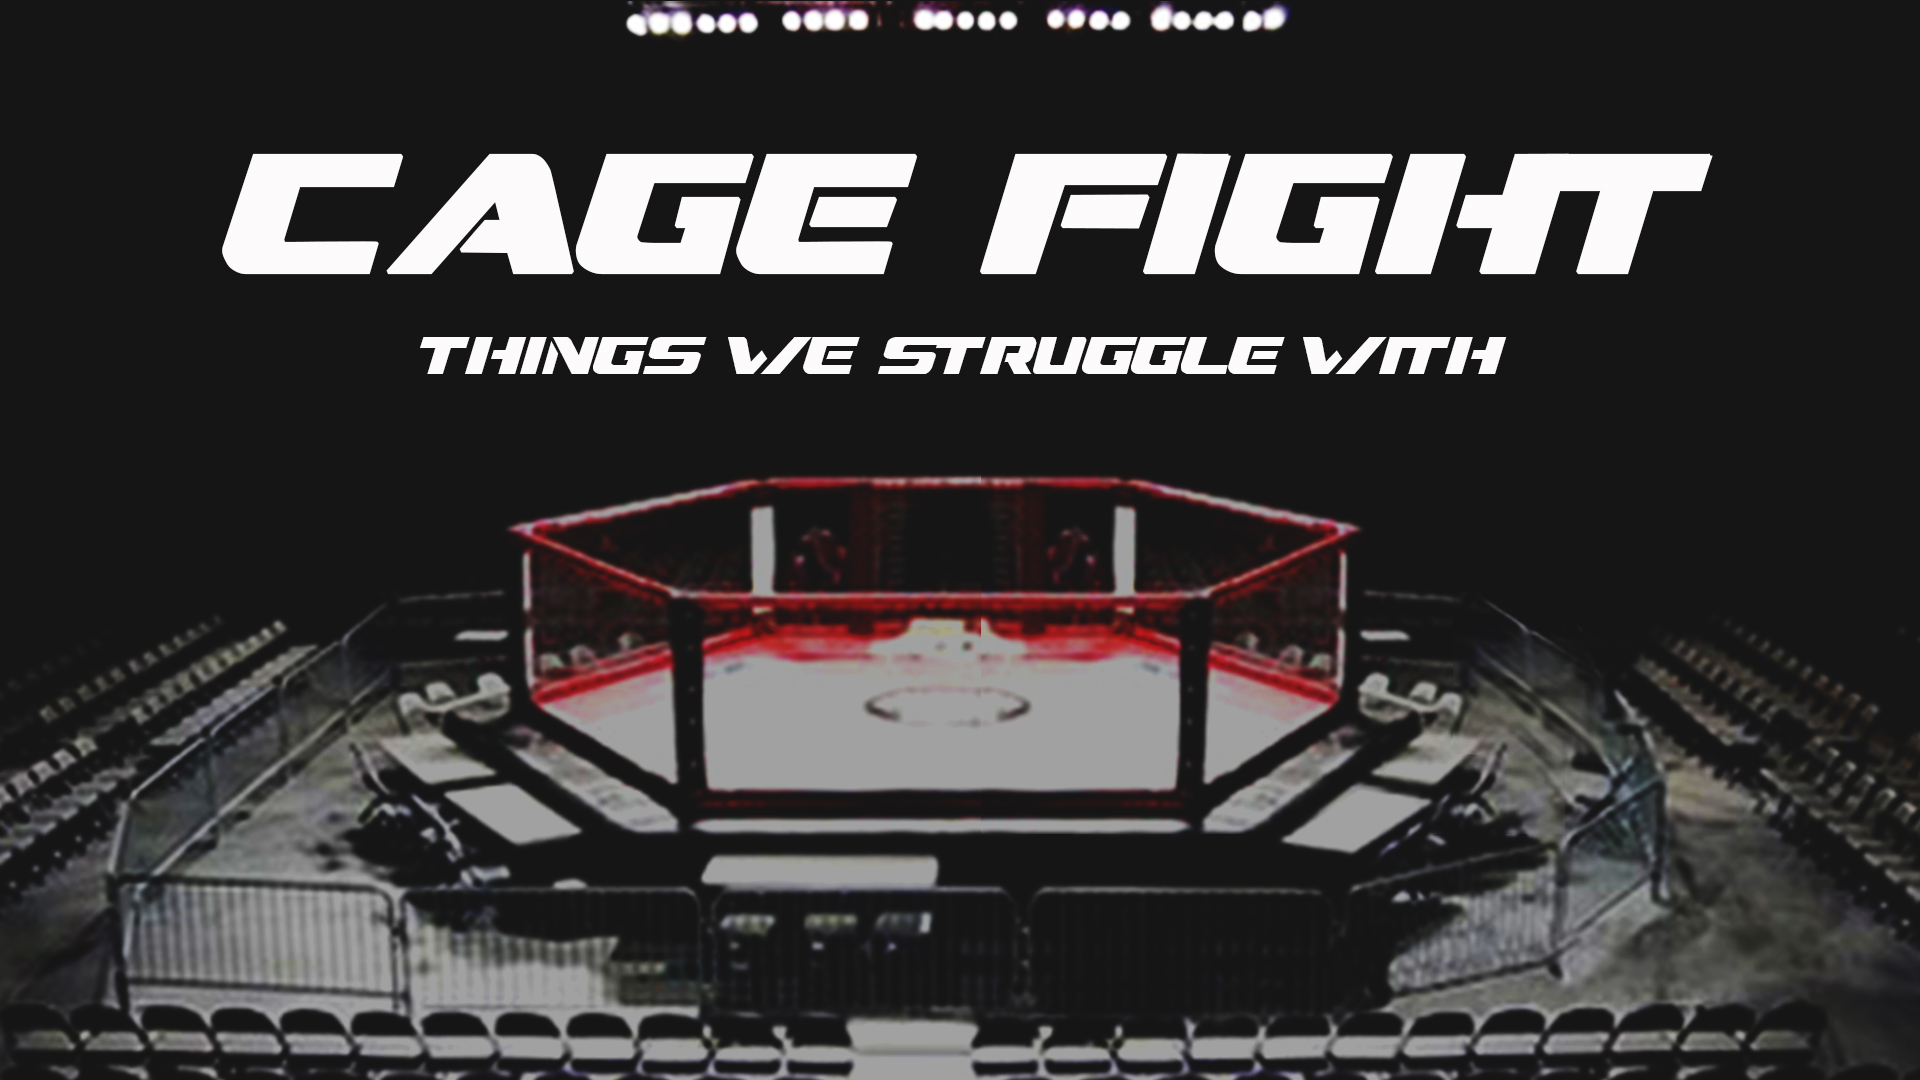 Cage Fight Logo.jpg